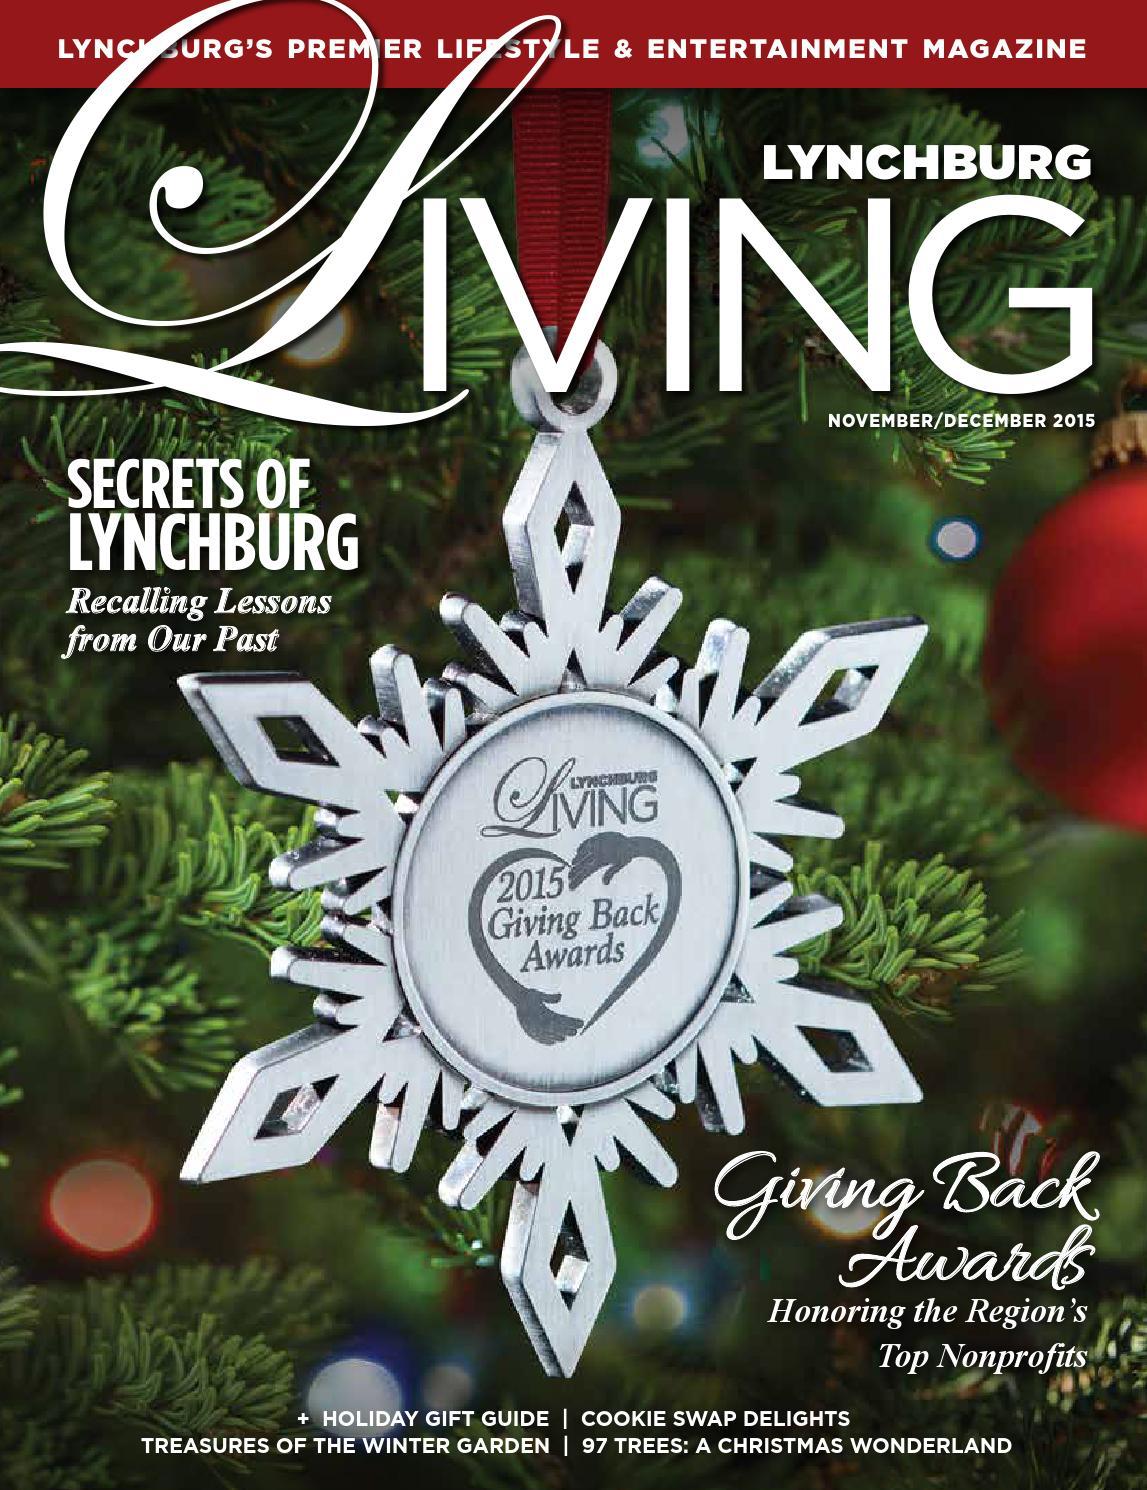 lynchburg living november december 2015 by vistagraphics issuu